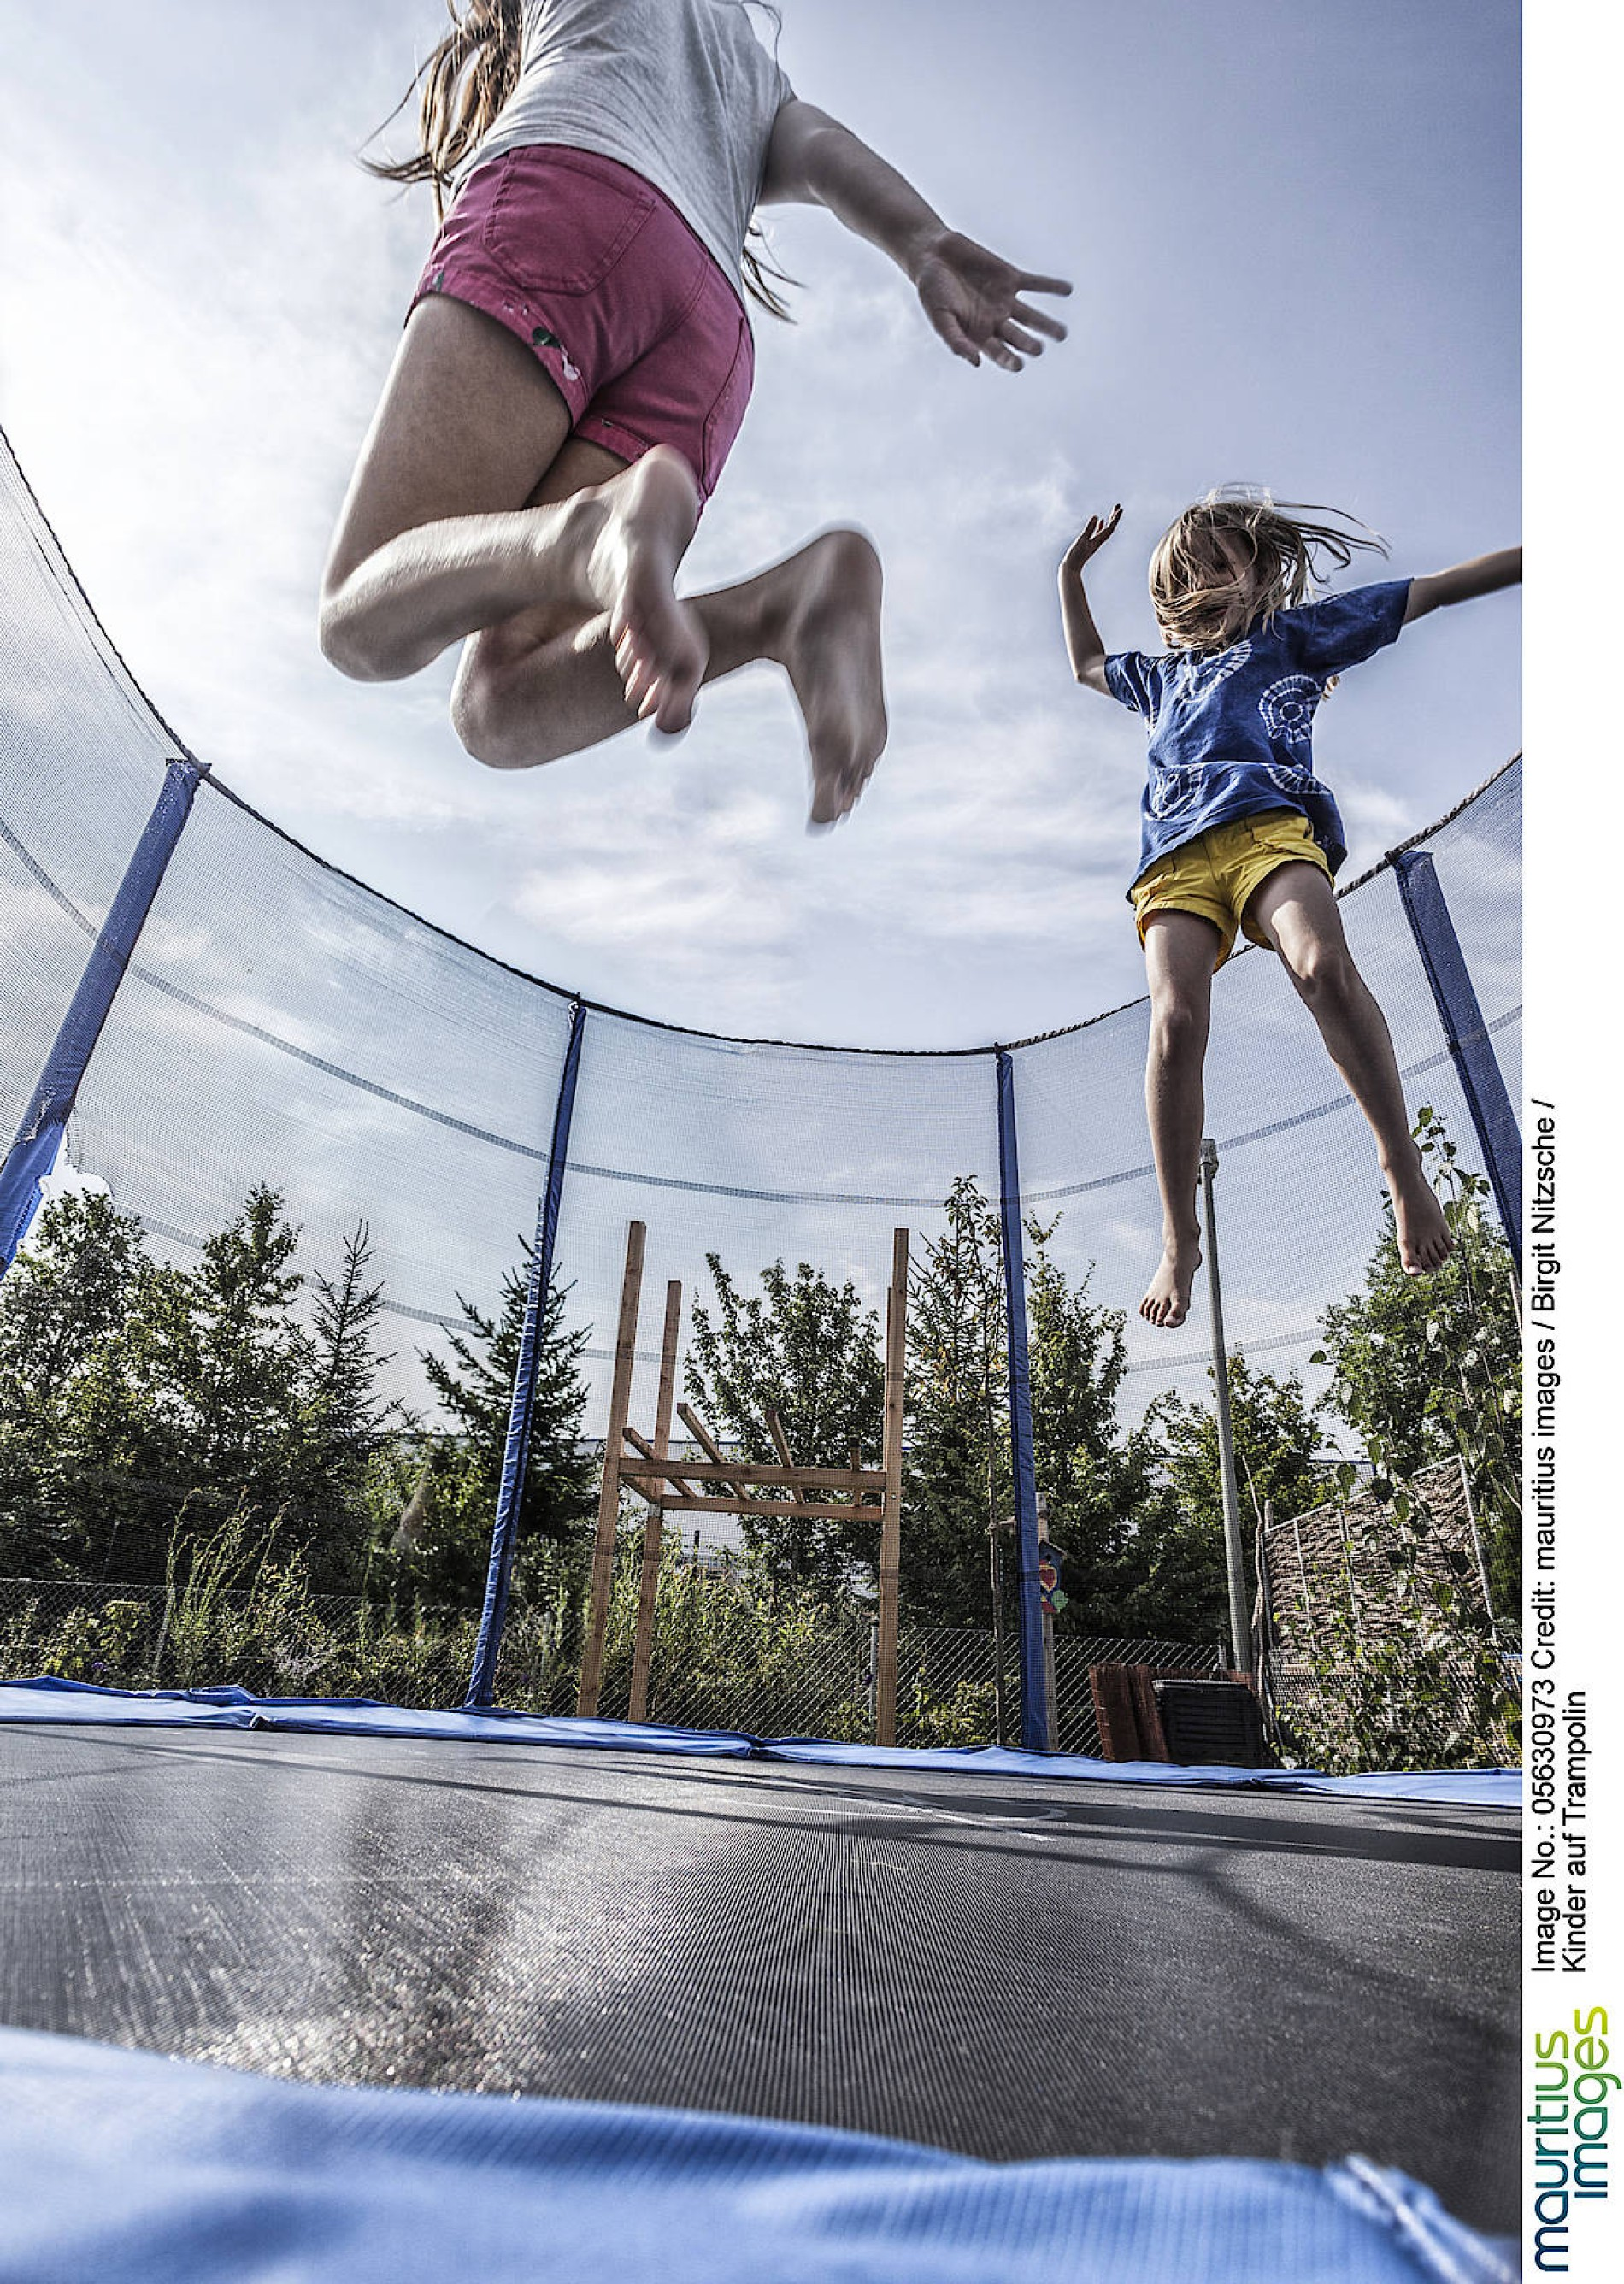 Kinder auf dem Trampolin: Bloß kein Salto mortale